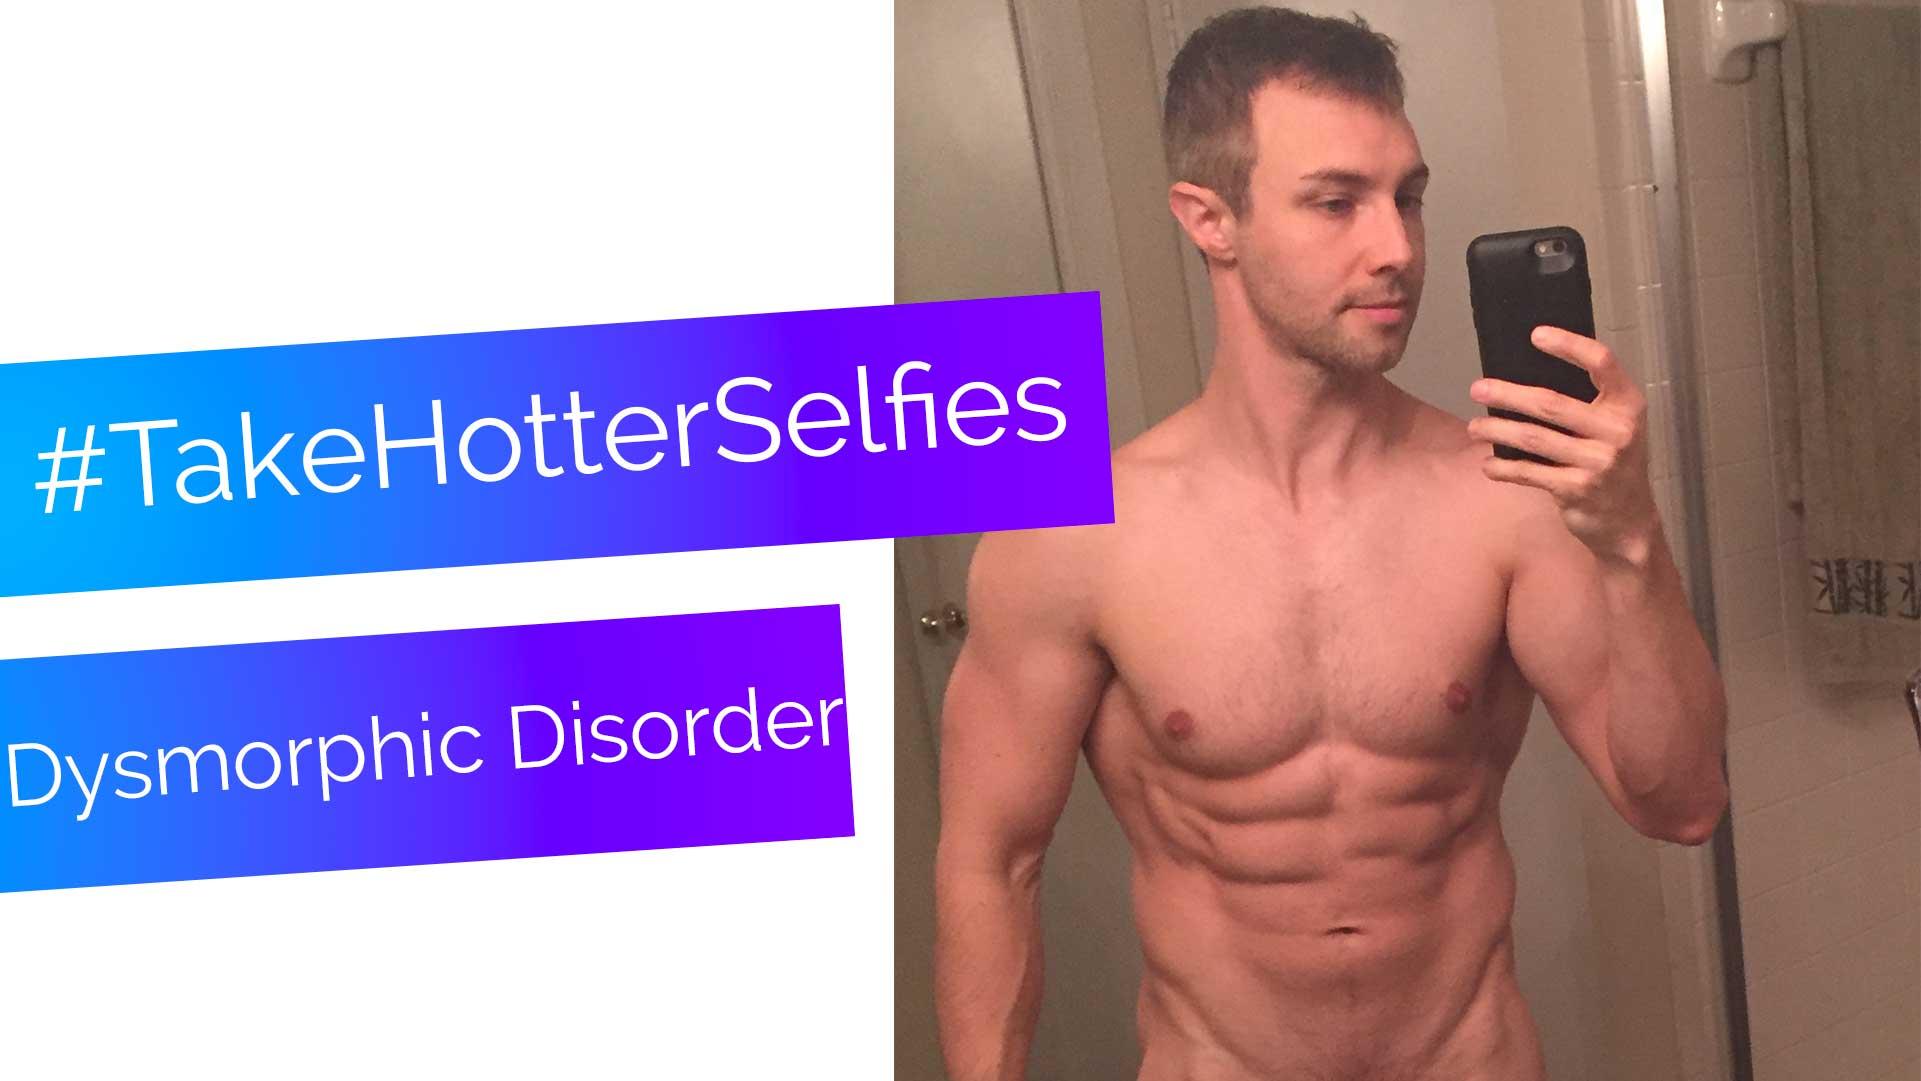 #TakeHotterSelfies: Body Dysmorphic Disorder